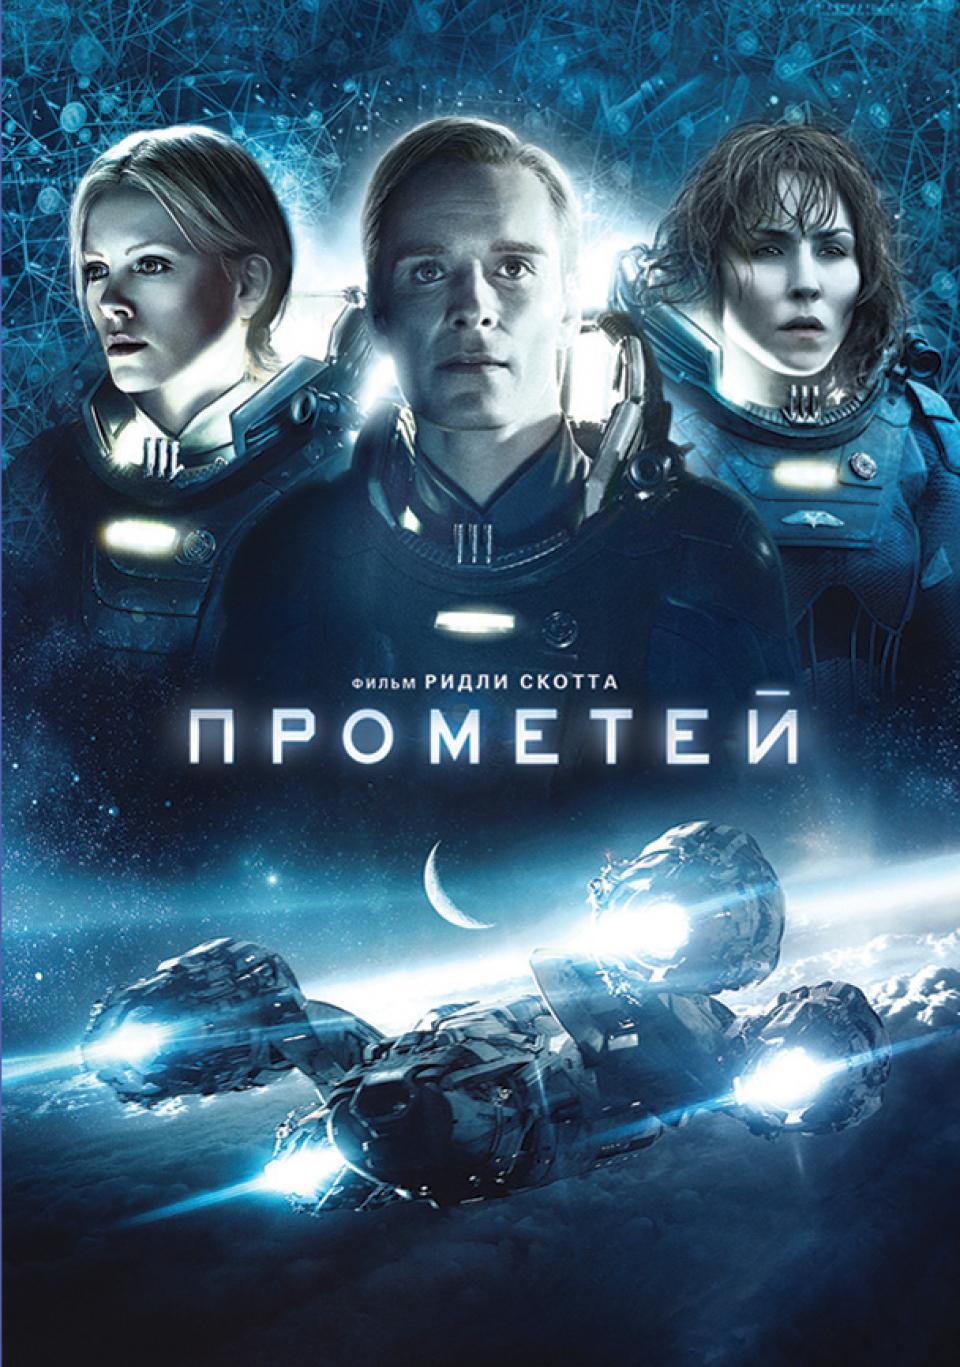 Фото Kinopoisk.ru